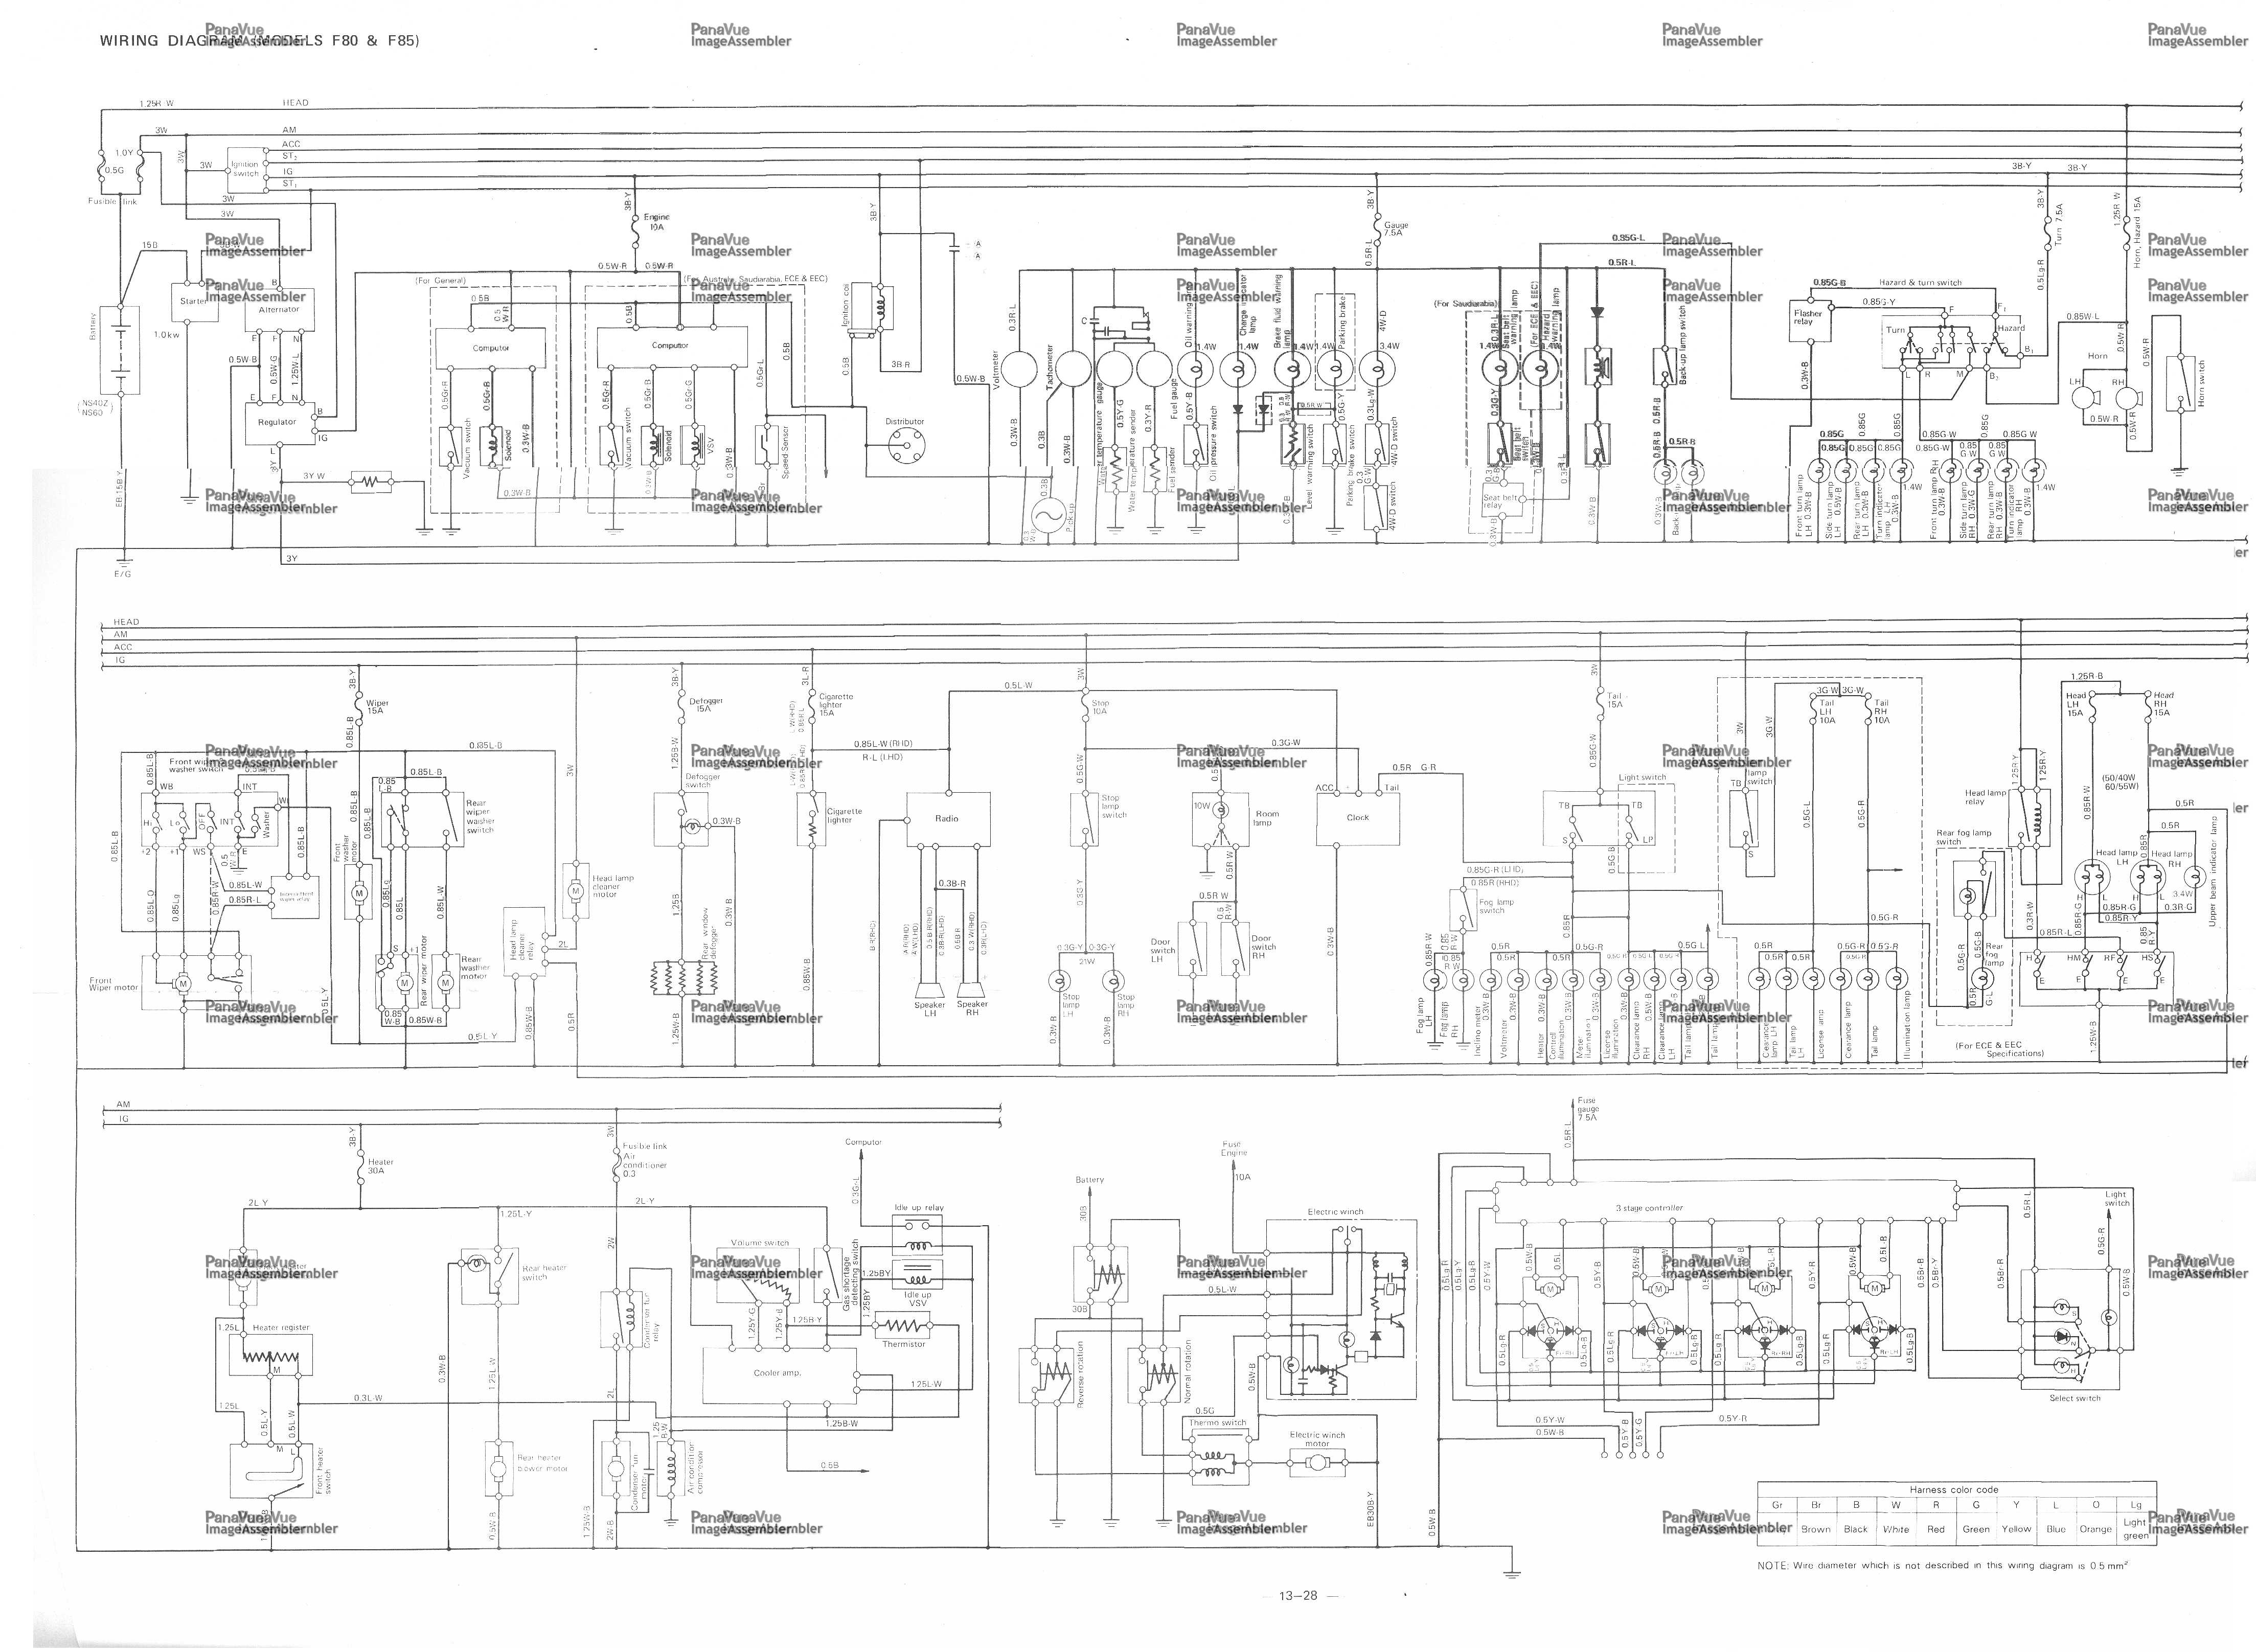 Electrical Wiring Diagram Daihatsu Cuore | Wiring Diagram